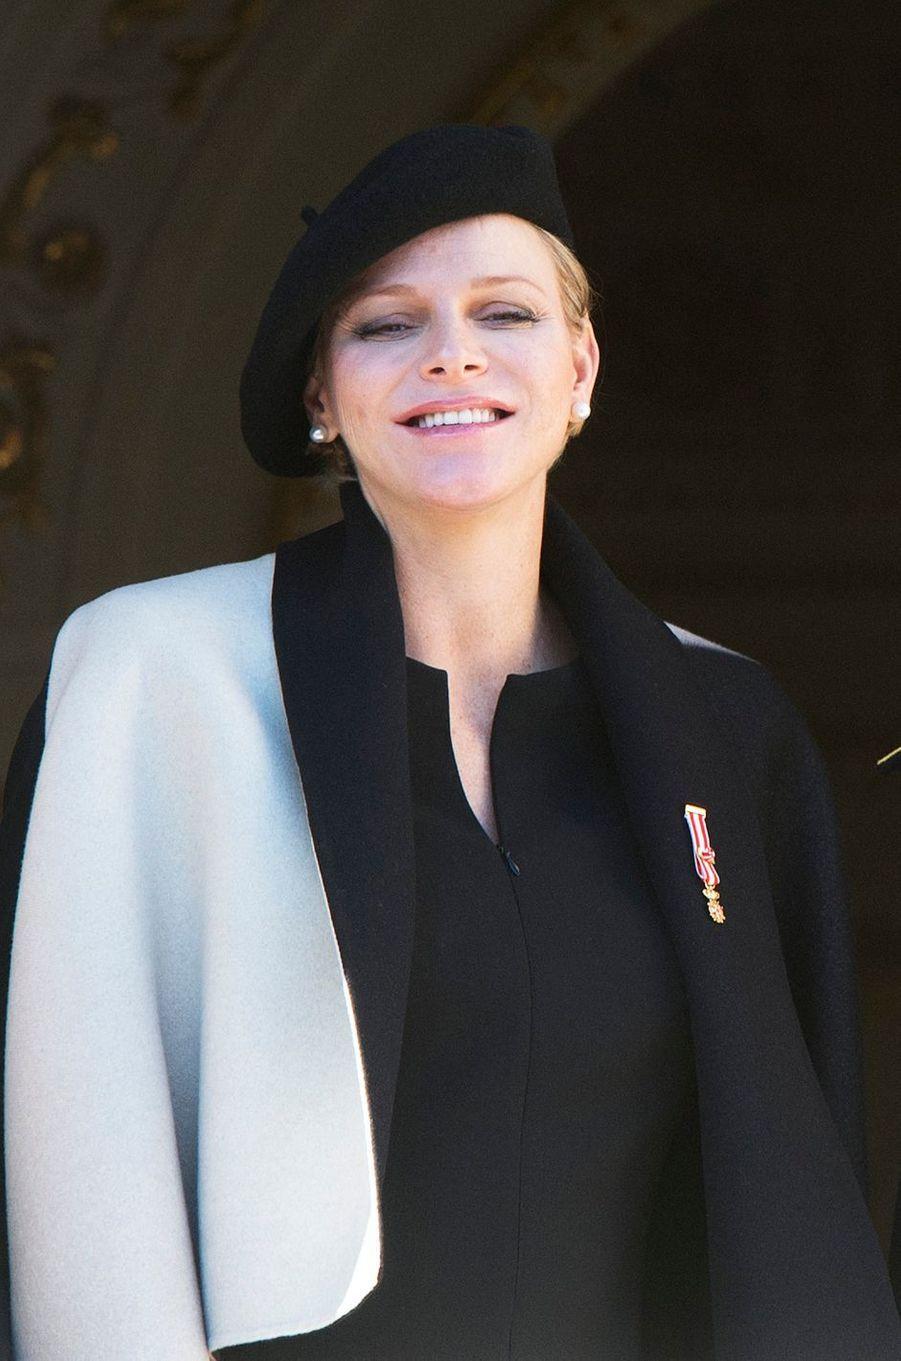 La princesse Charlène de Monaco, le 19 novembre 2014